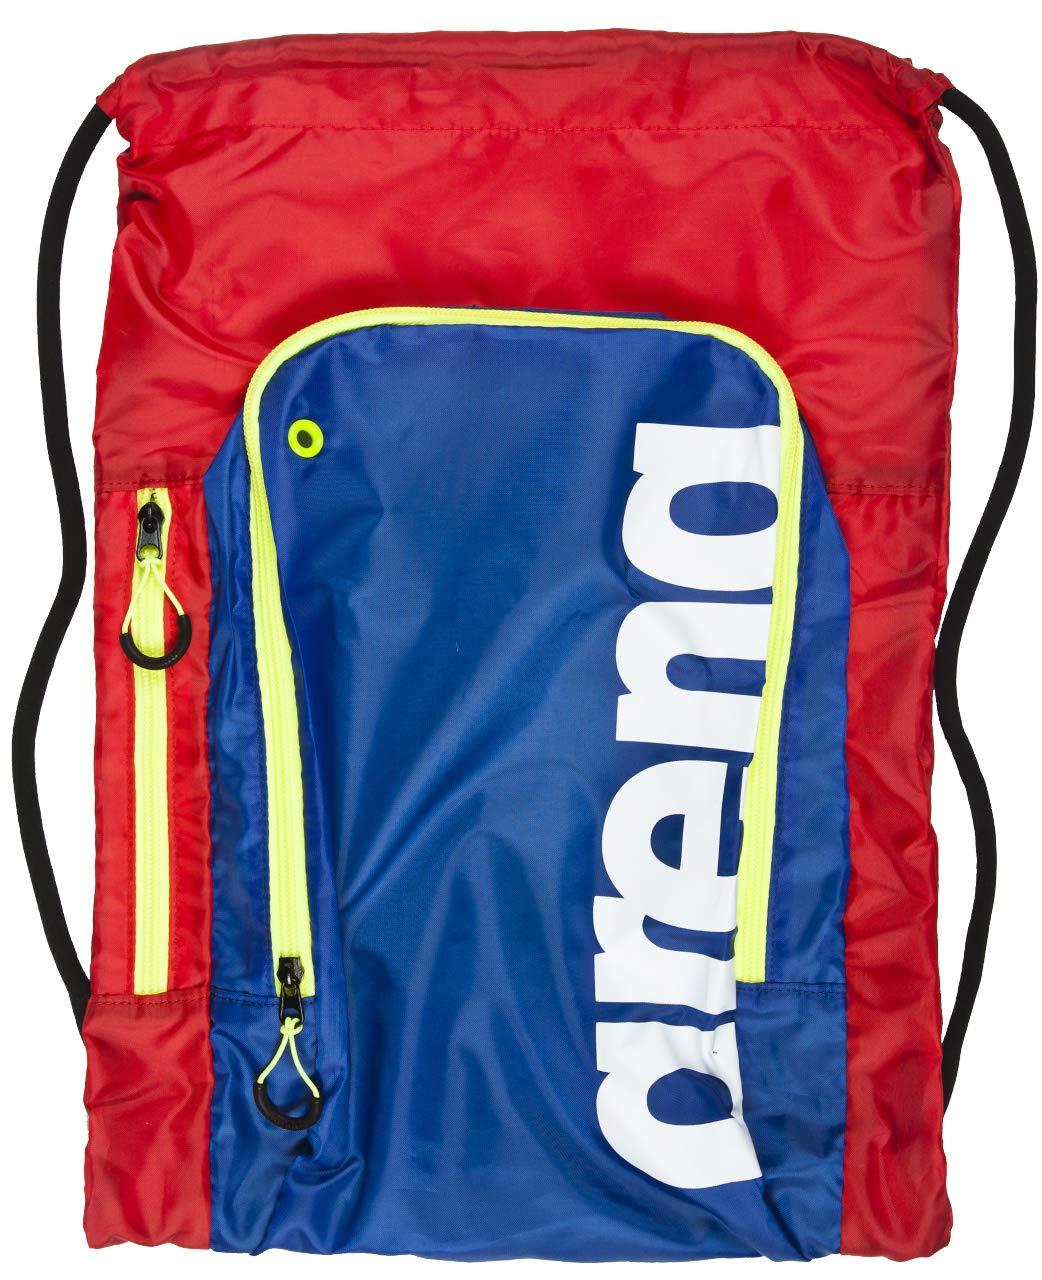 Arena Fast Sack Swim Drawstring Backpack, Red/Blue